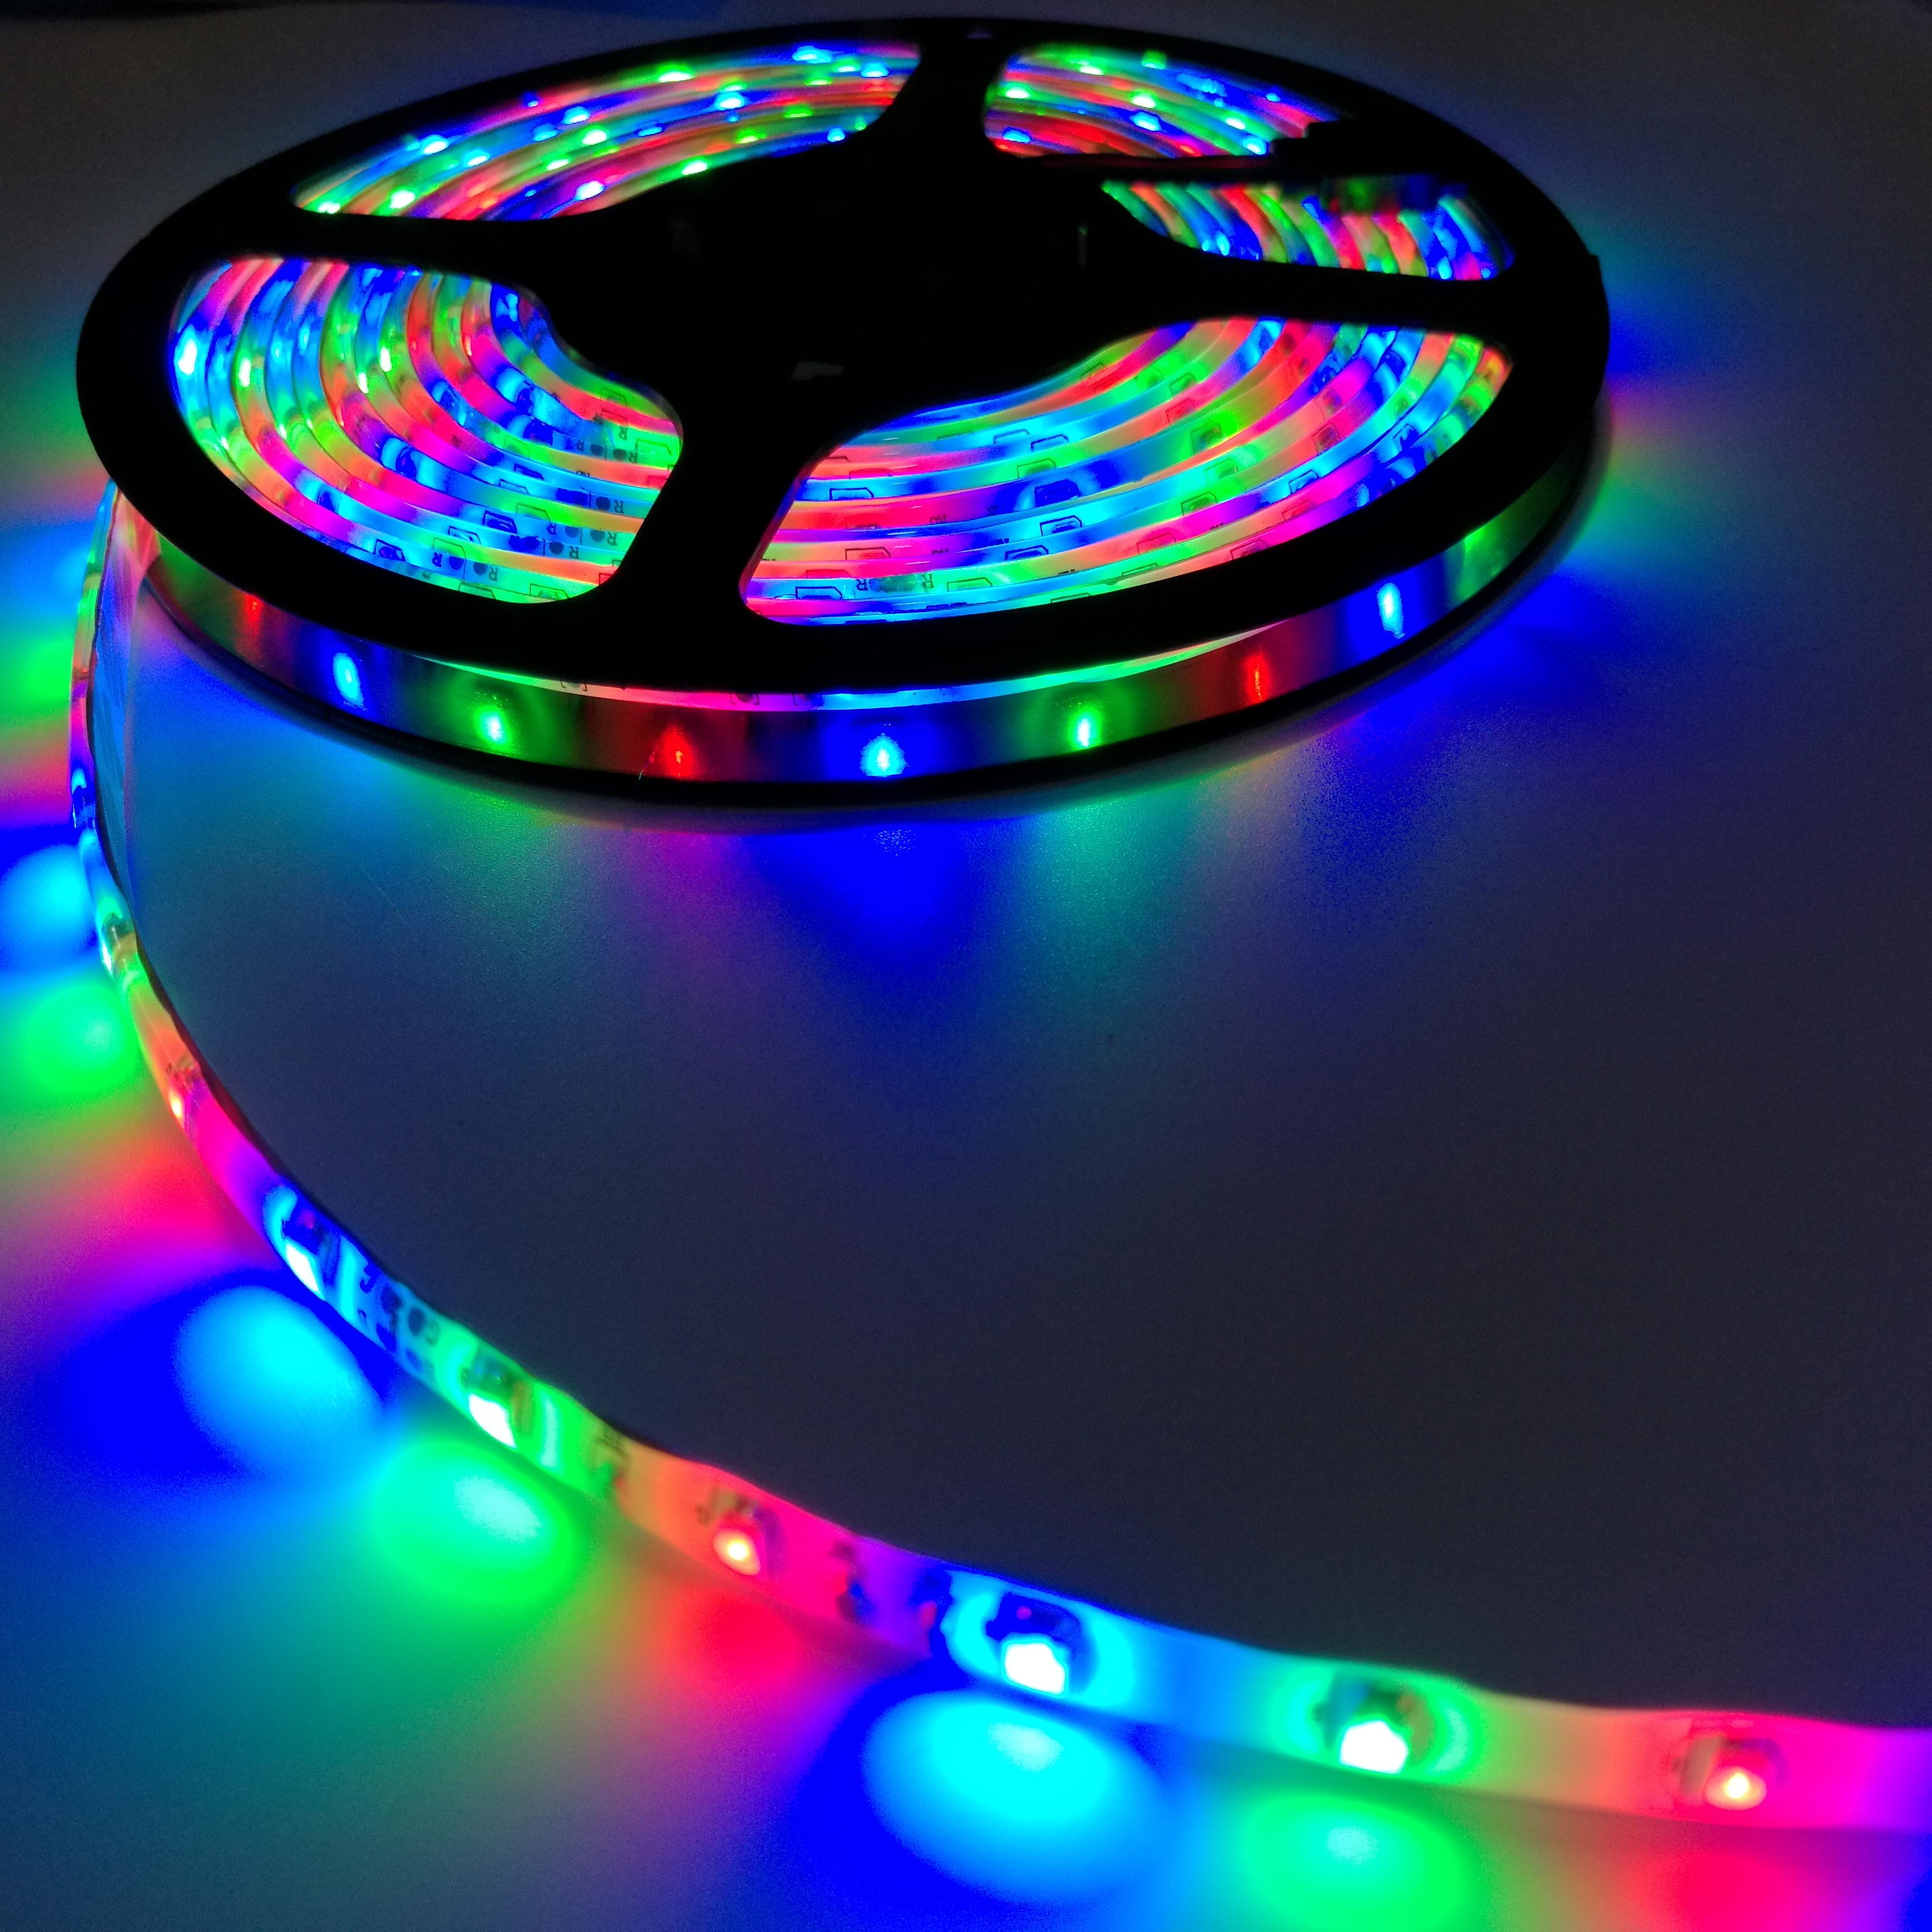 LED 3528滴胶防水灯带/软灯条 (60灯/米) 3528七彩灯条 3528七彩流水灯条